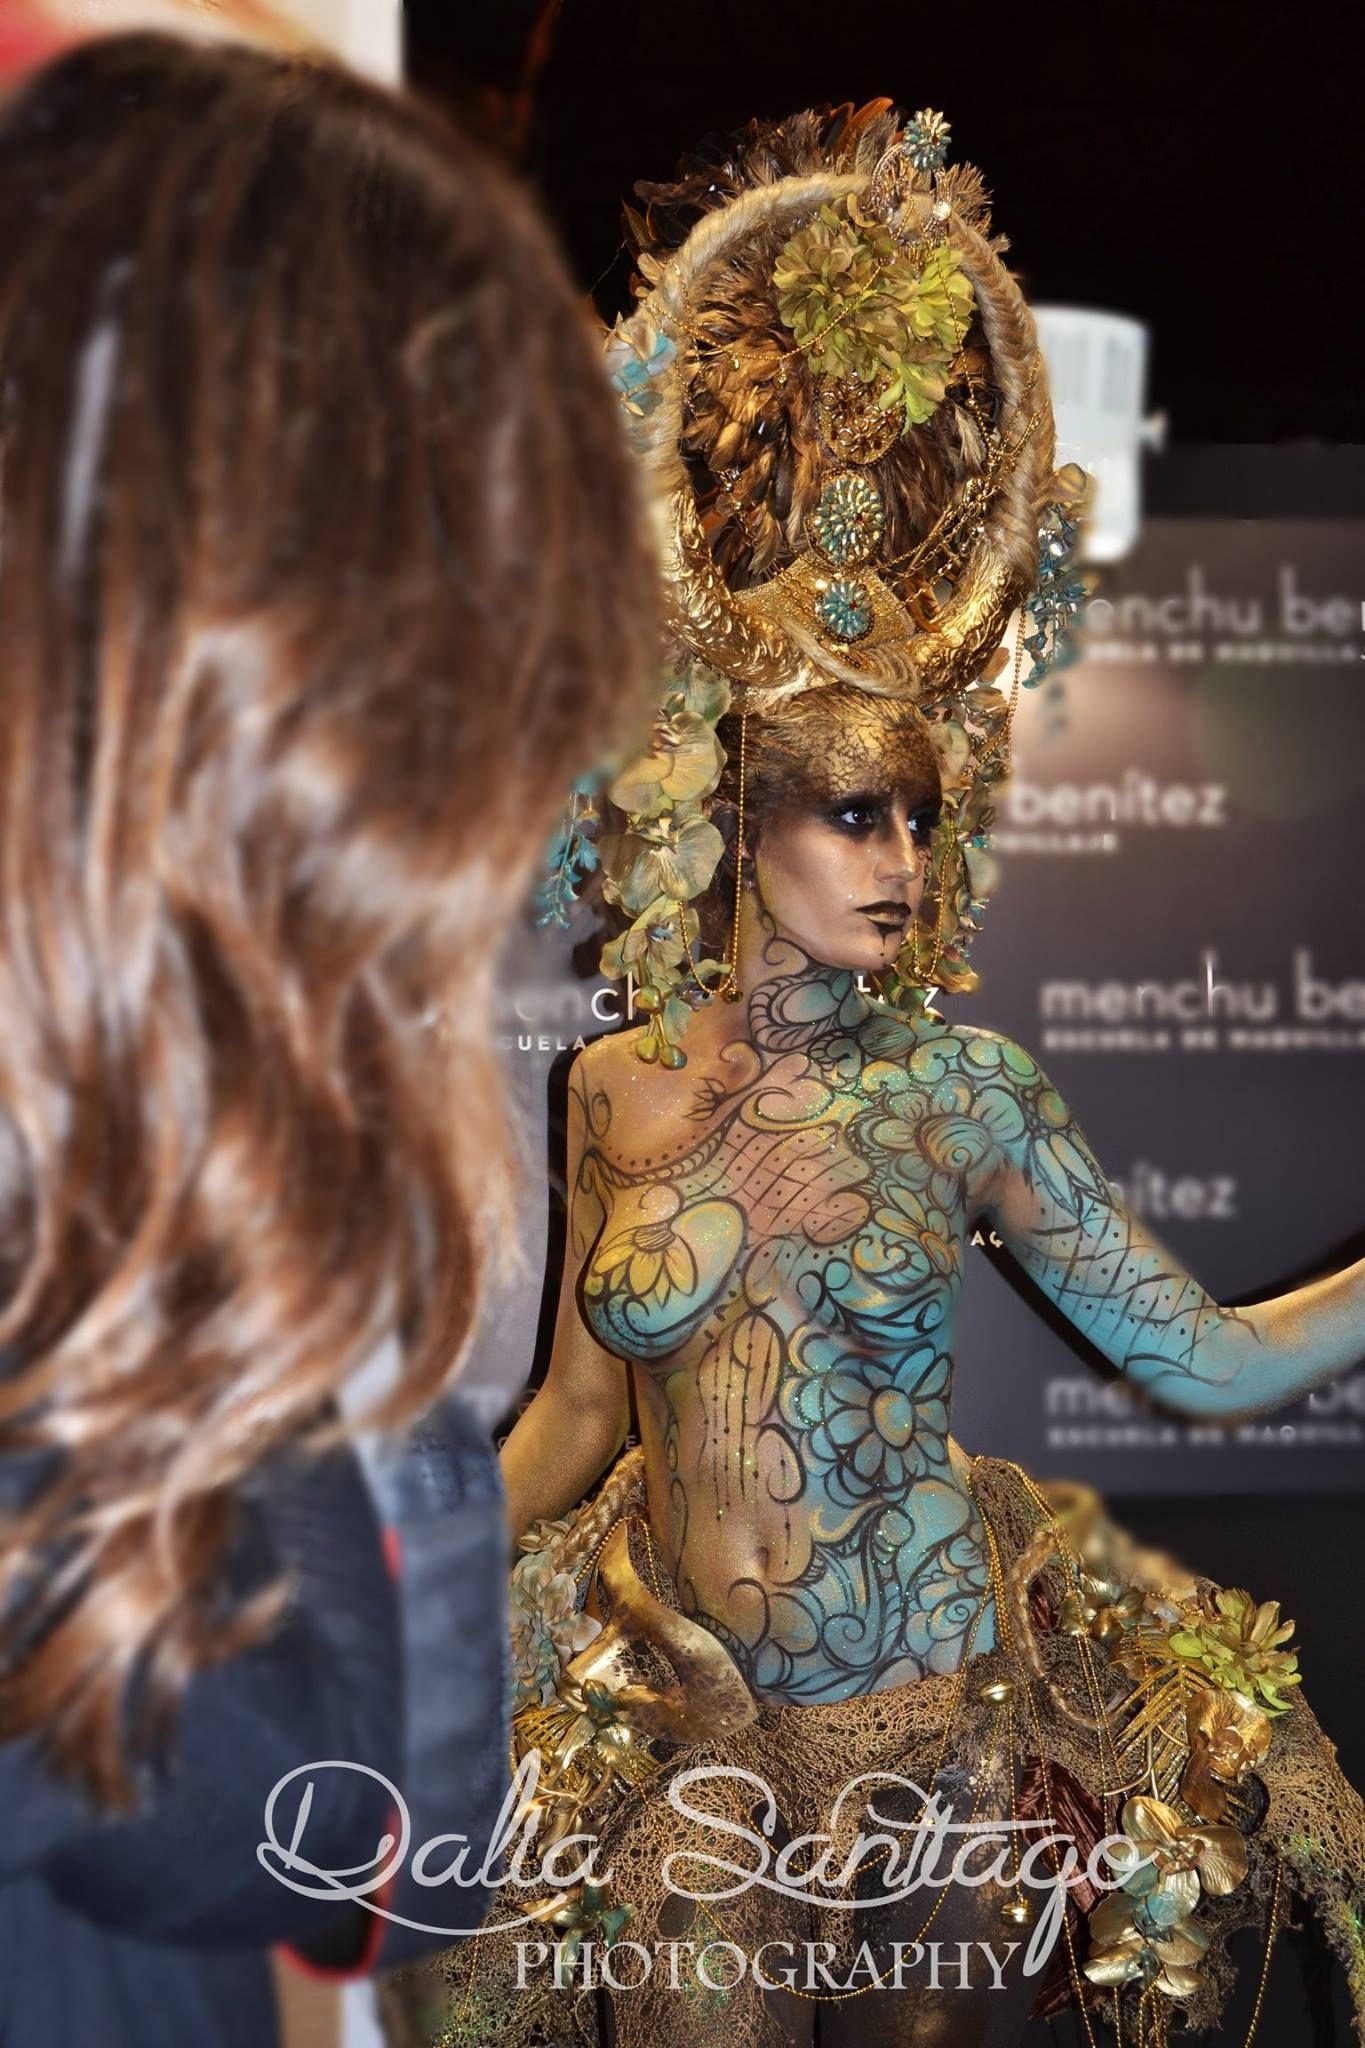 Maquillajes Realizados El Sábado En Expobellezaandalucia Con Productos Makeupforever Sevill Tatuajes De Arte Corporal Pintura De Arte Corporal Estilo Tribal